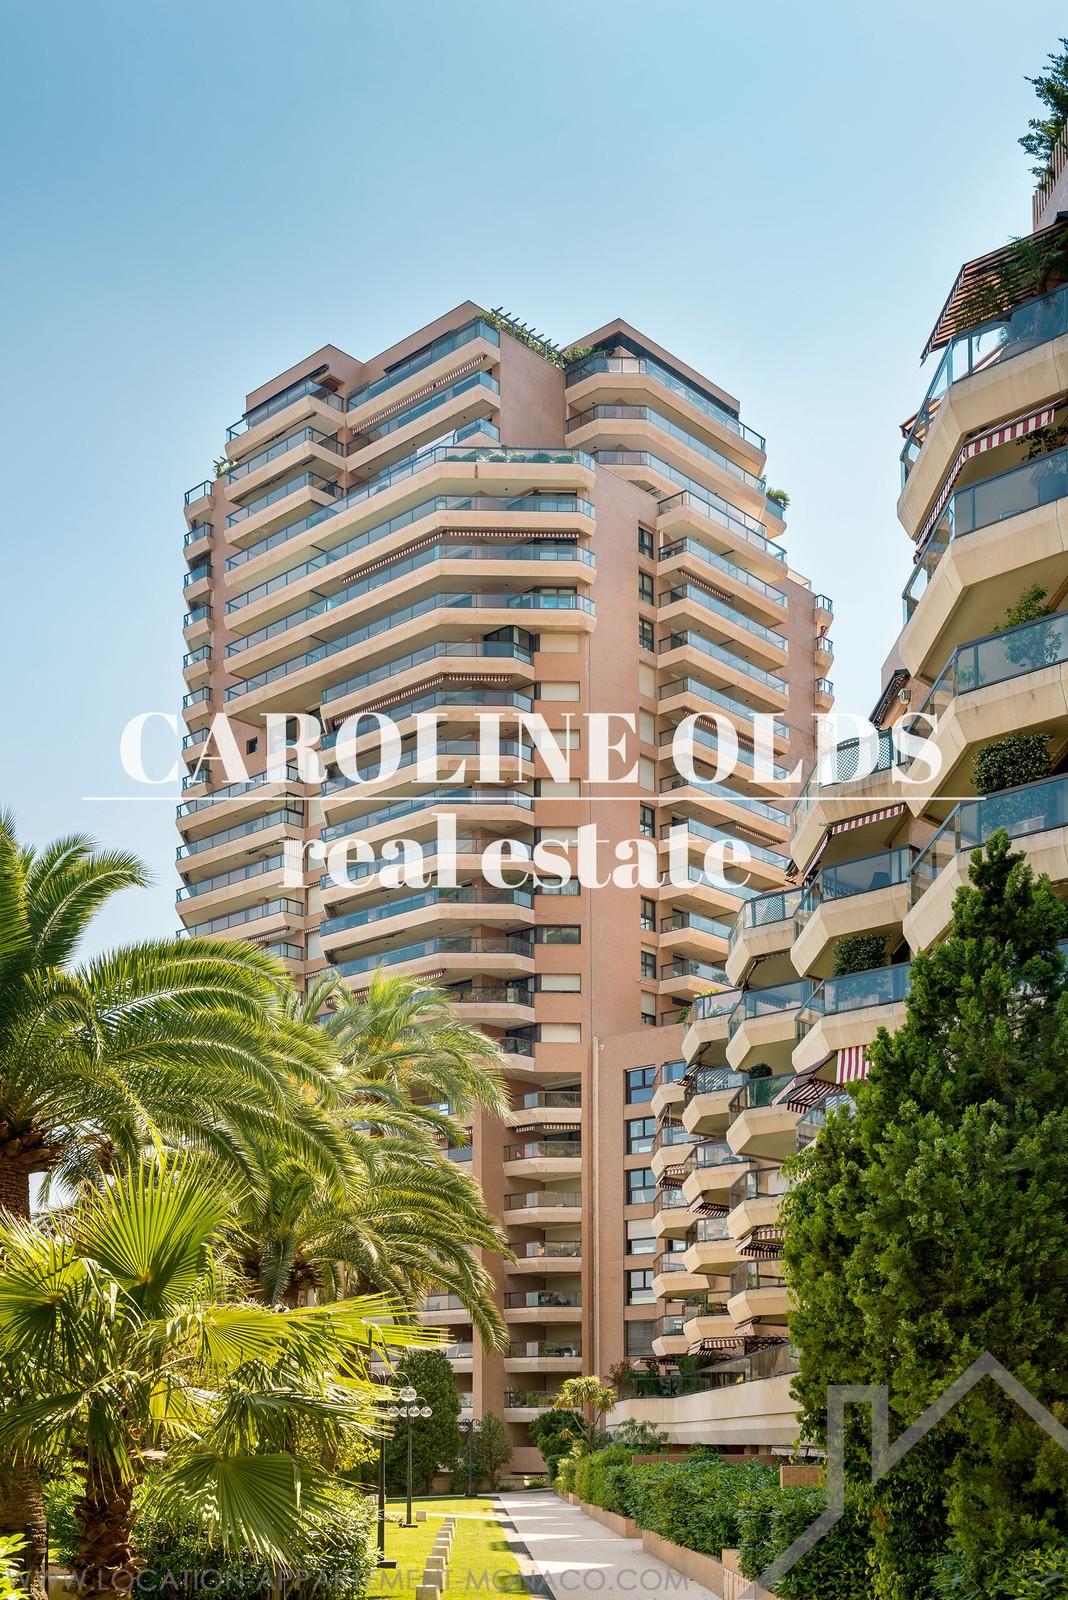 office monte carlo sun apartments for rent in monaco